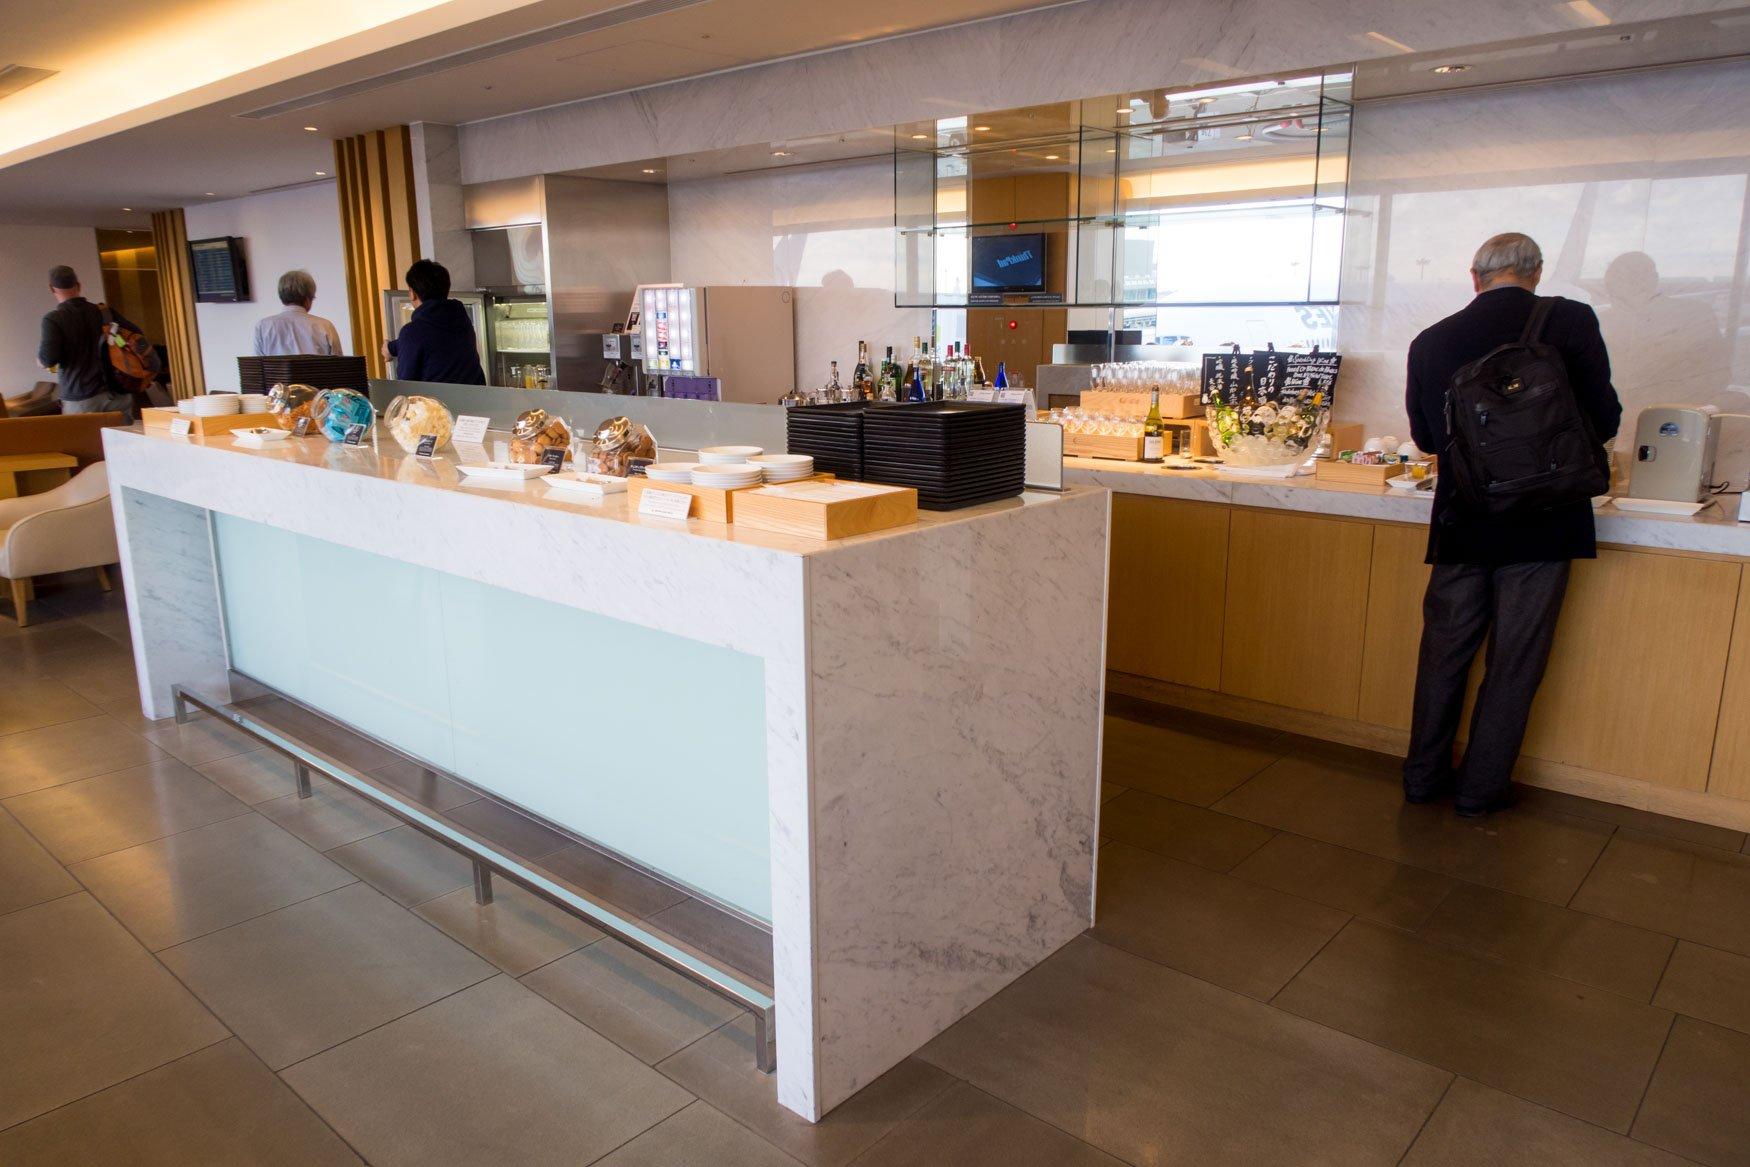 JAL Sakura Lounge Drinks and Snacks Area